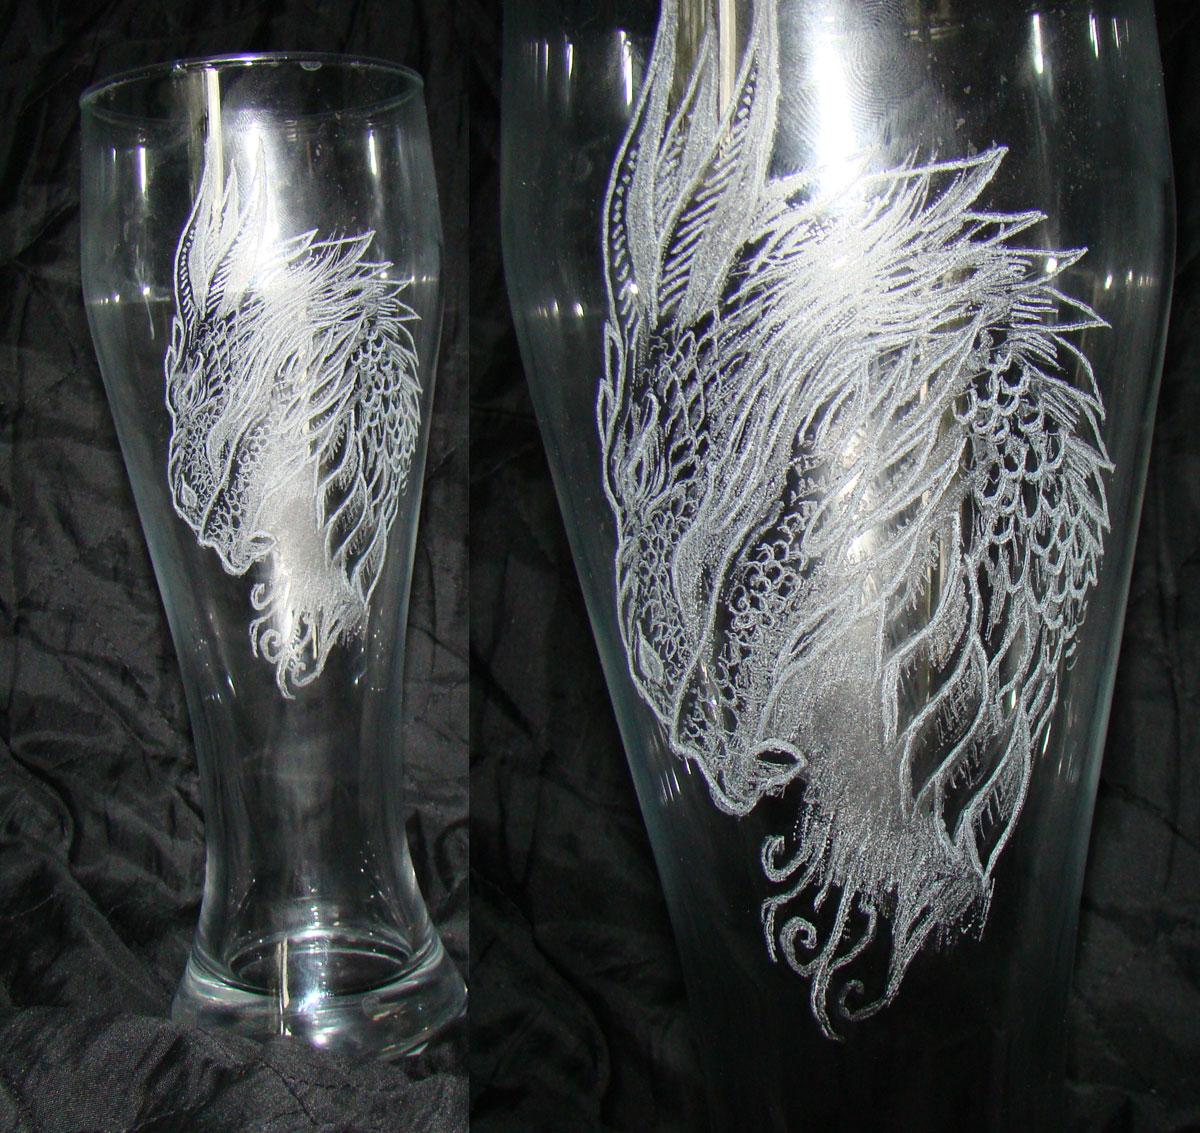 Dragon glass by MatesLaurentiu